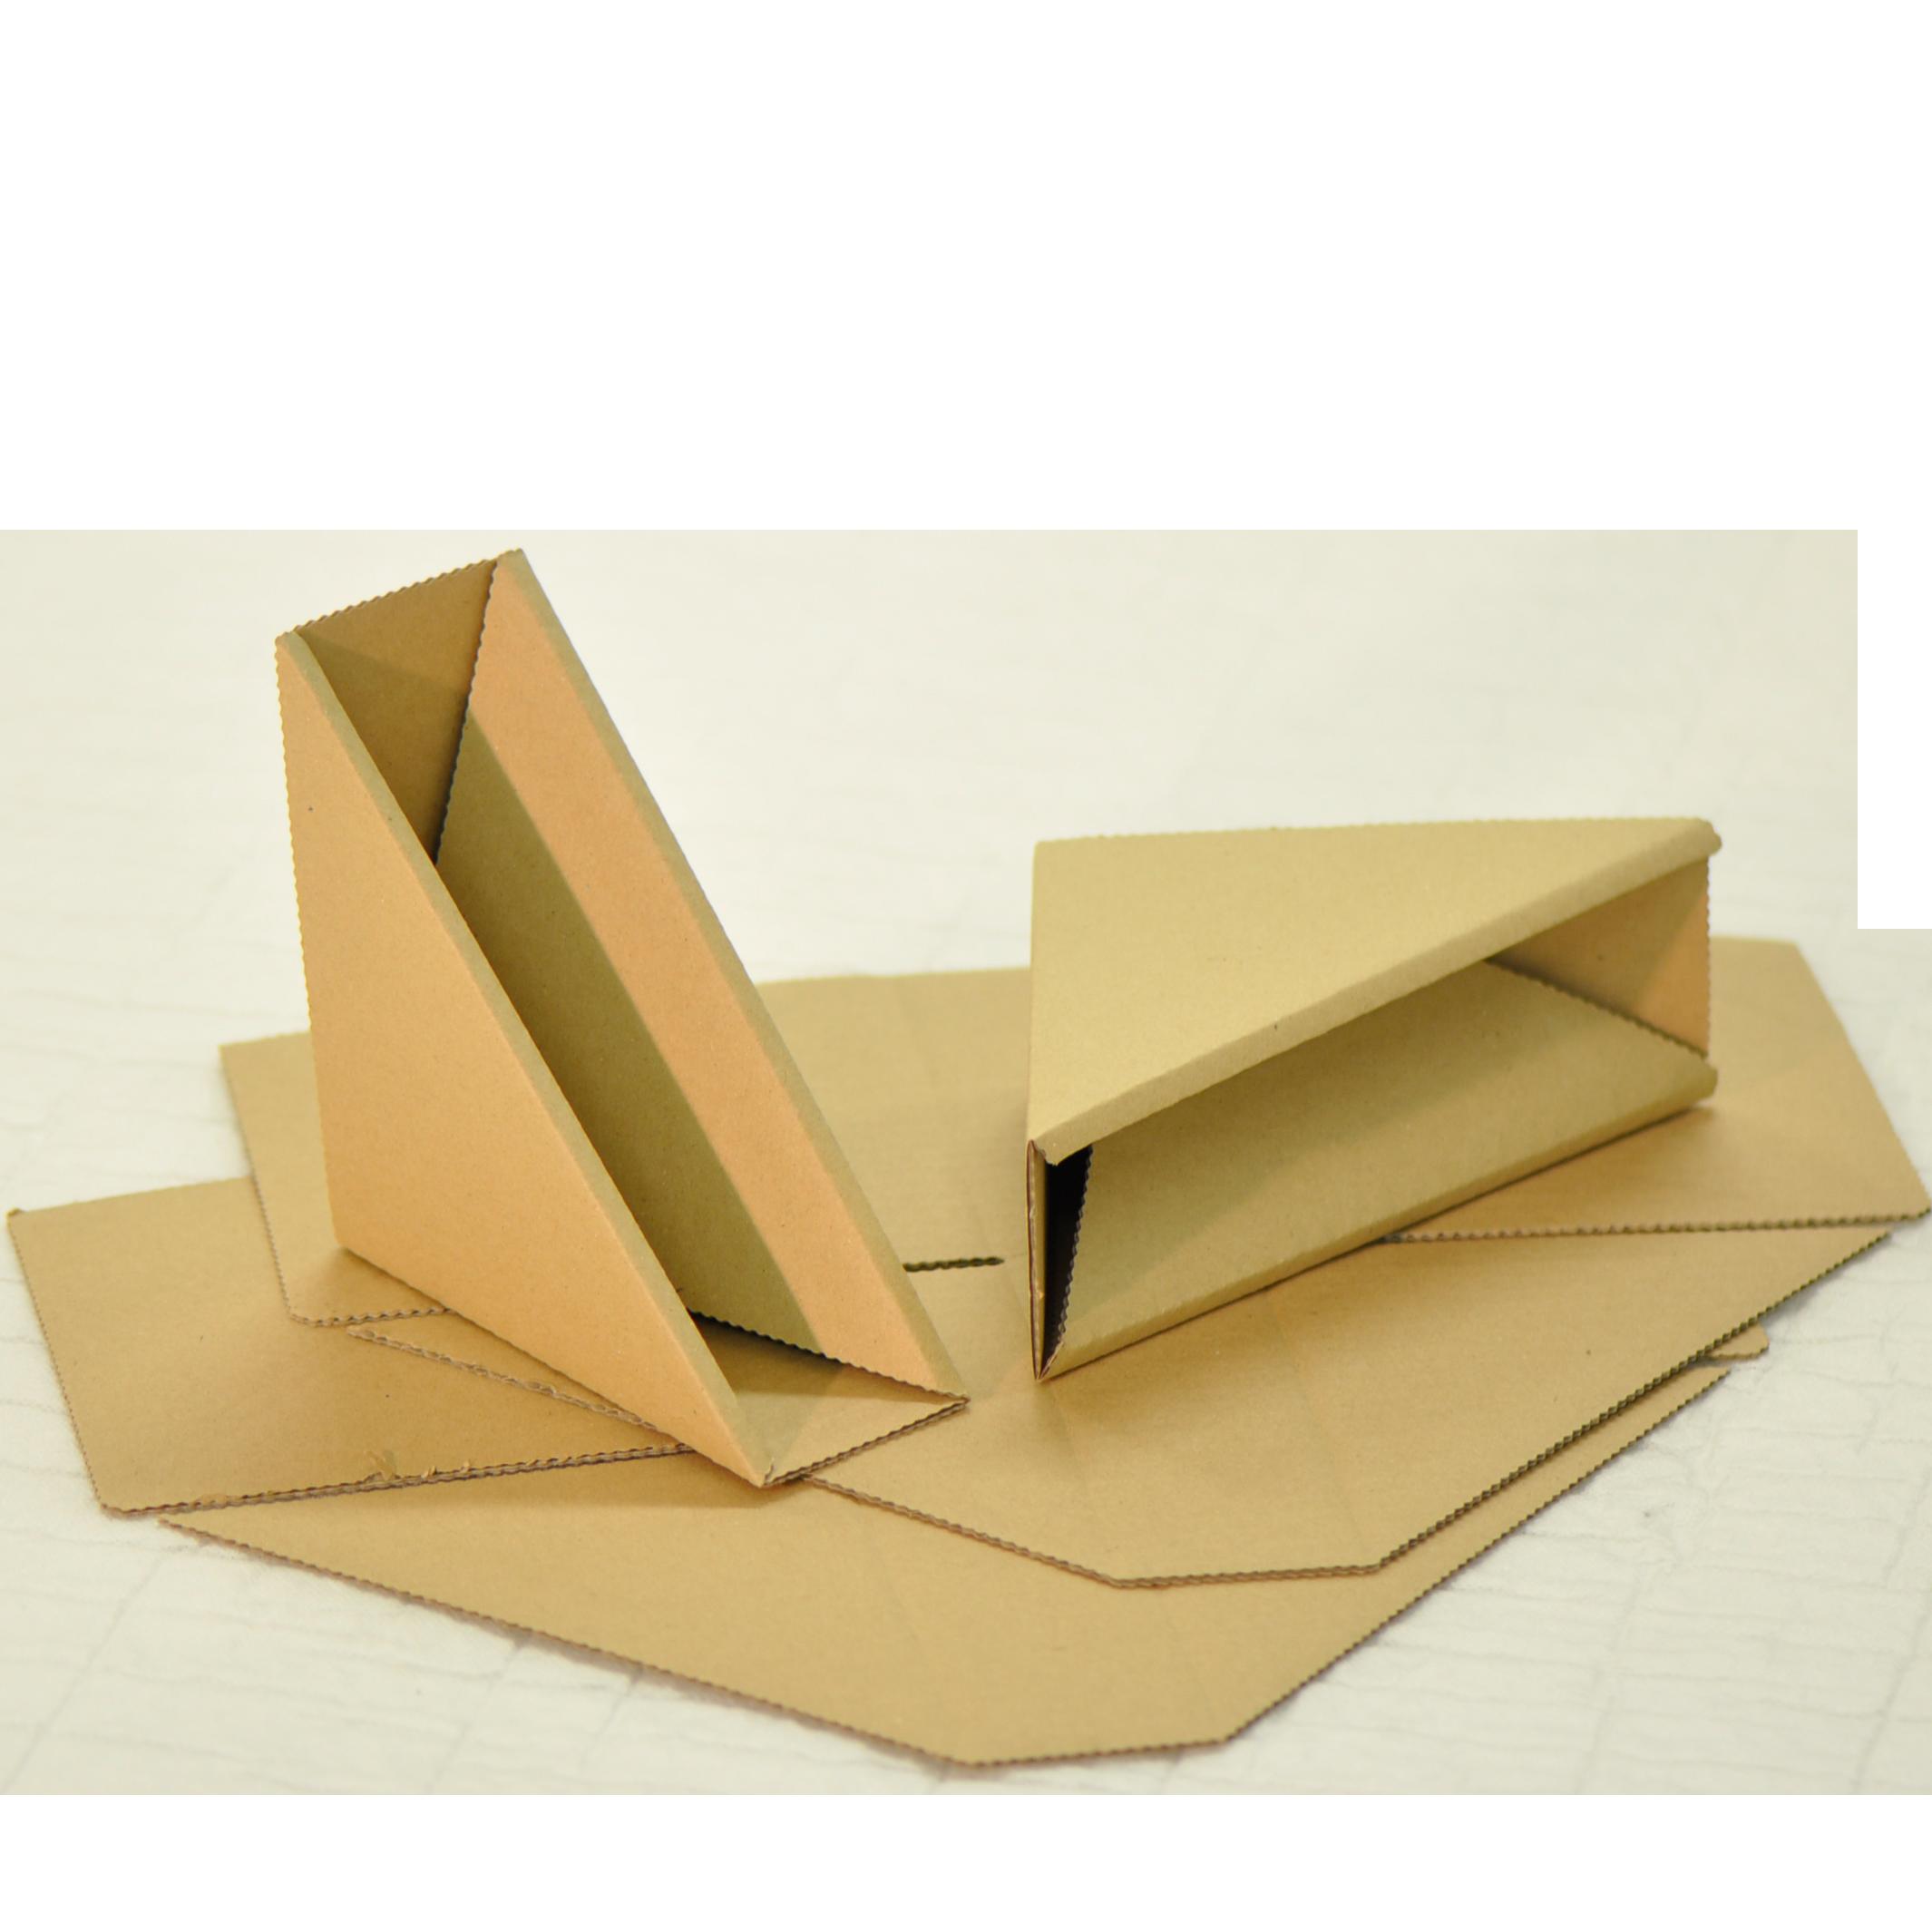 bis 40 kg belastbar Stabile Ware! Bücherkarton Profiqualität Umzugs